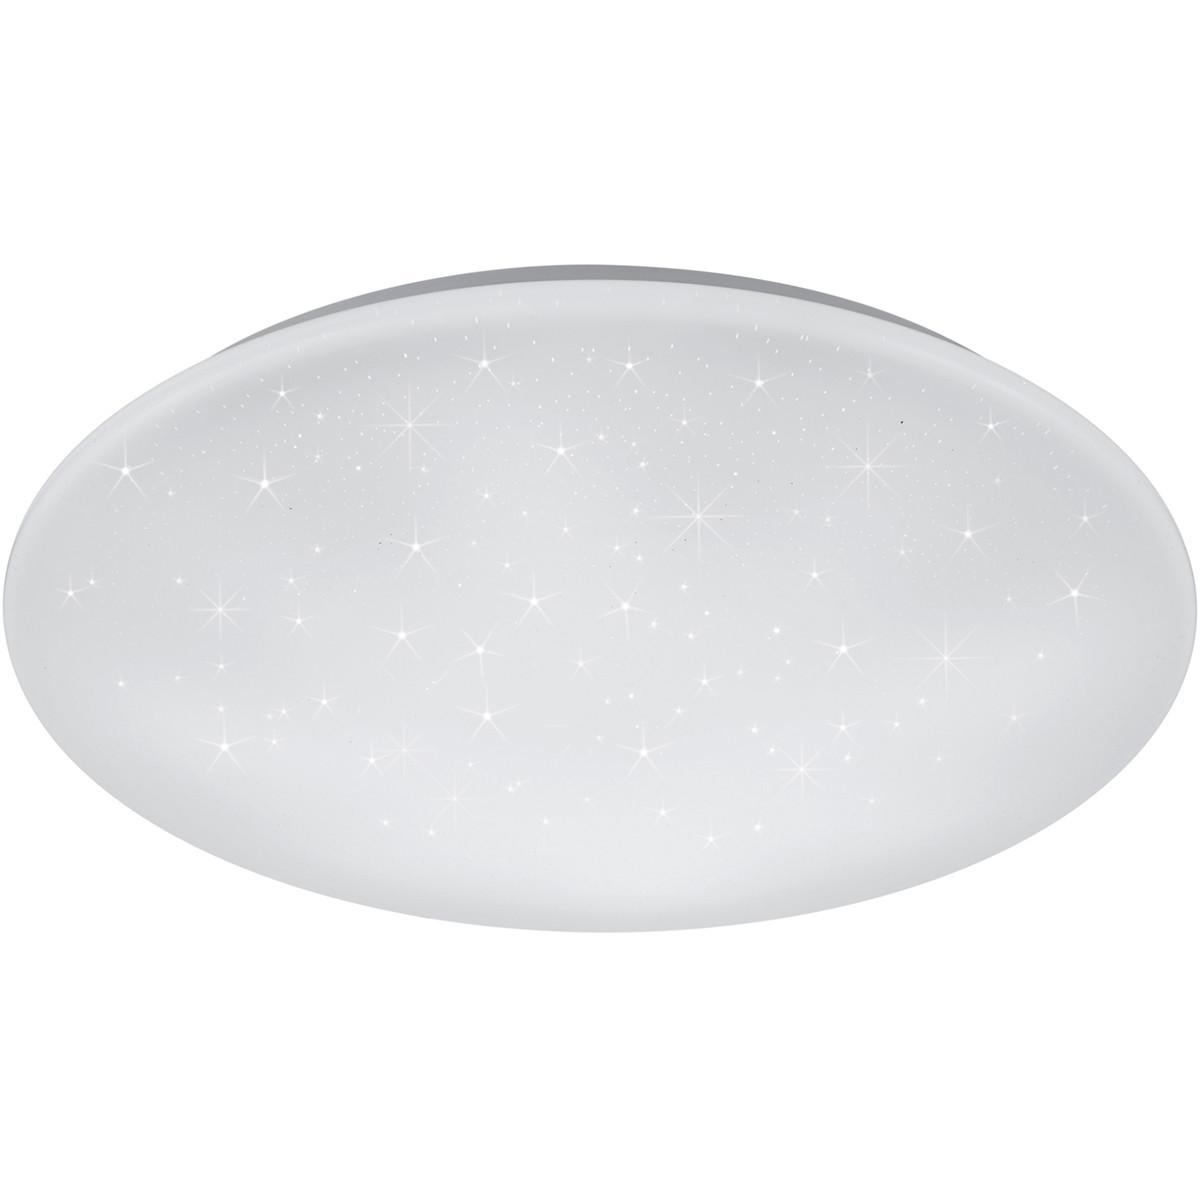 LED Plafondlamp - Trion Ster - 27W - Aanpasbare Kleur - Dimbaar - Afstandsbediening - Sterlicht - Ro